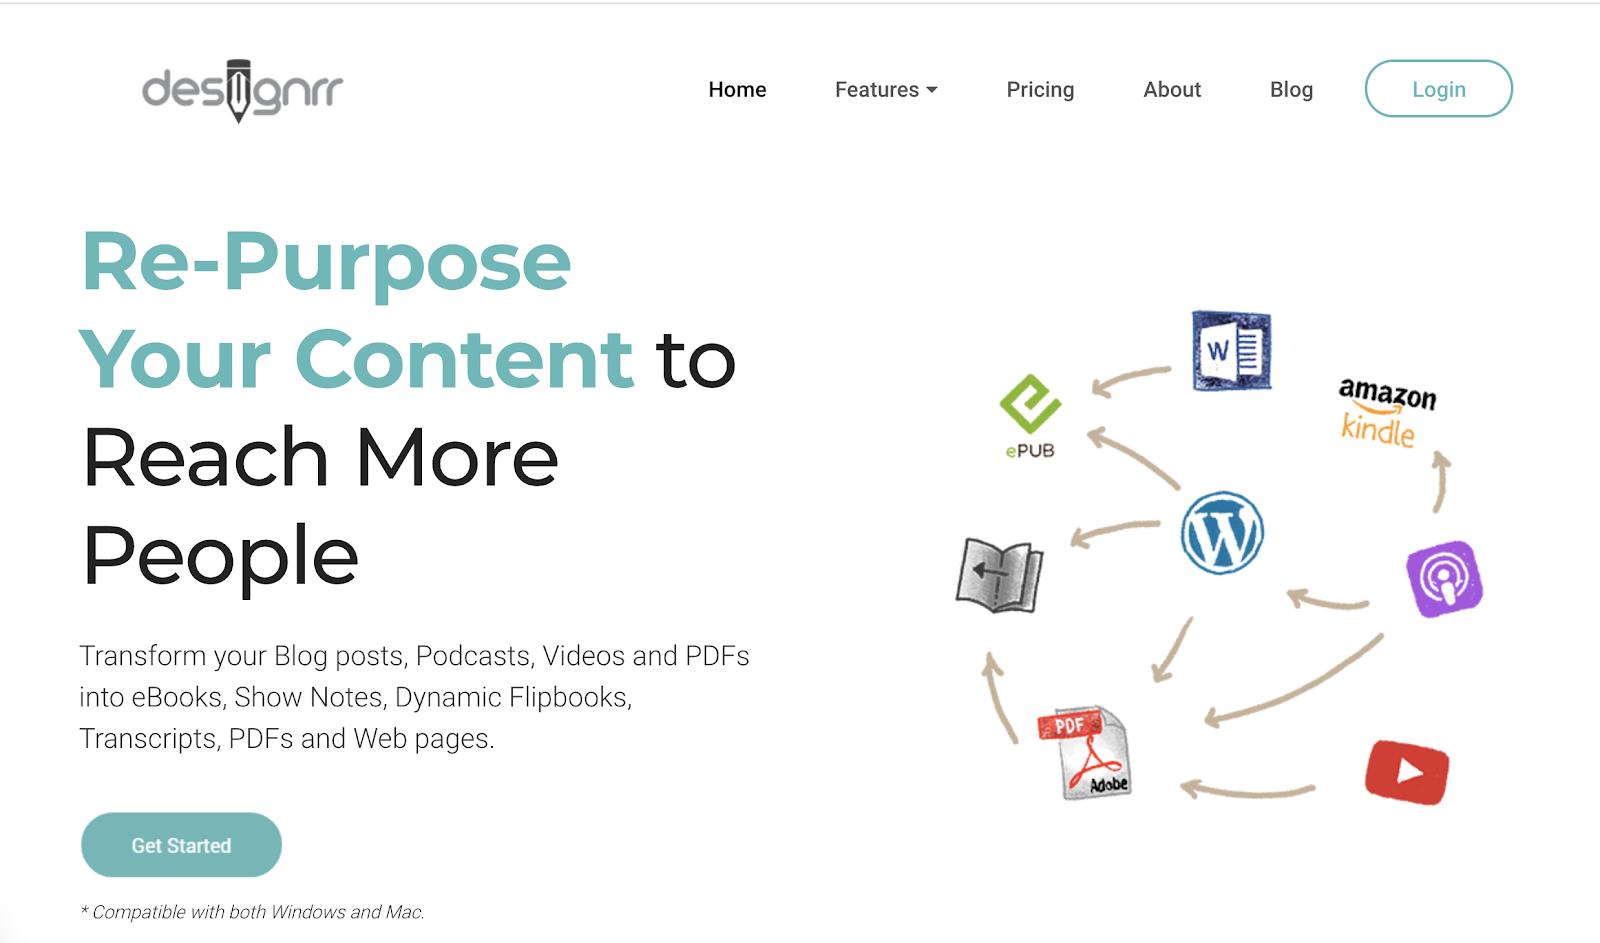 Designrr Homepage Screenshot (eBook Designer Tool)